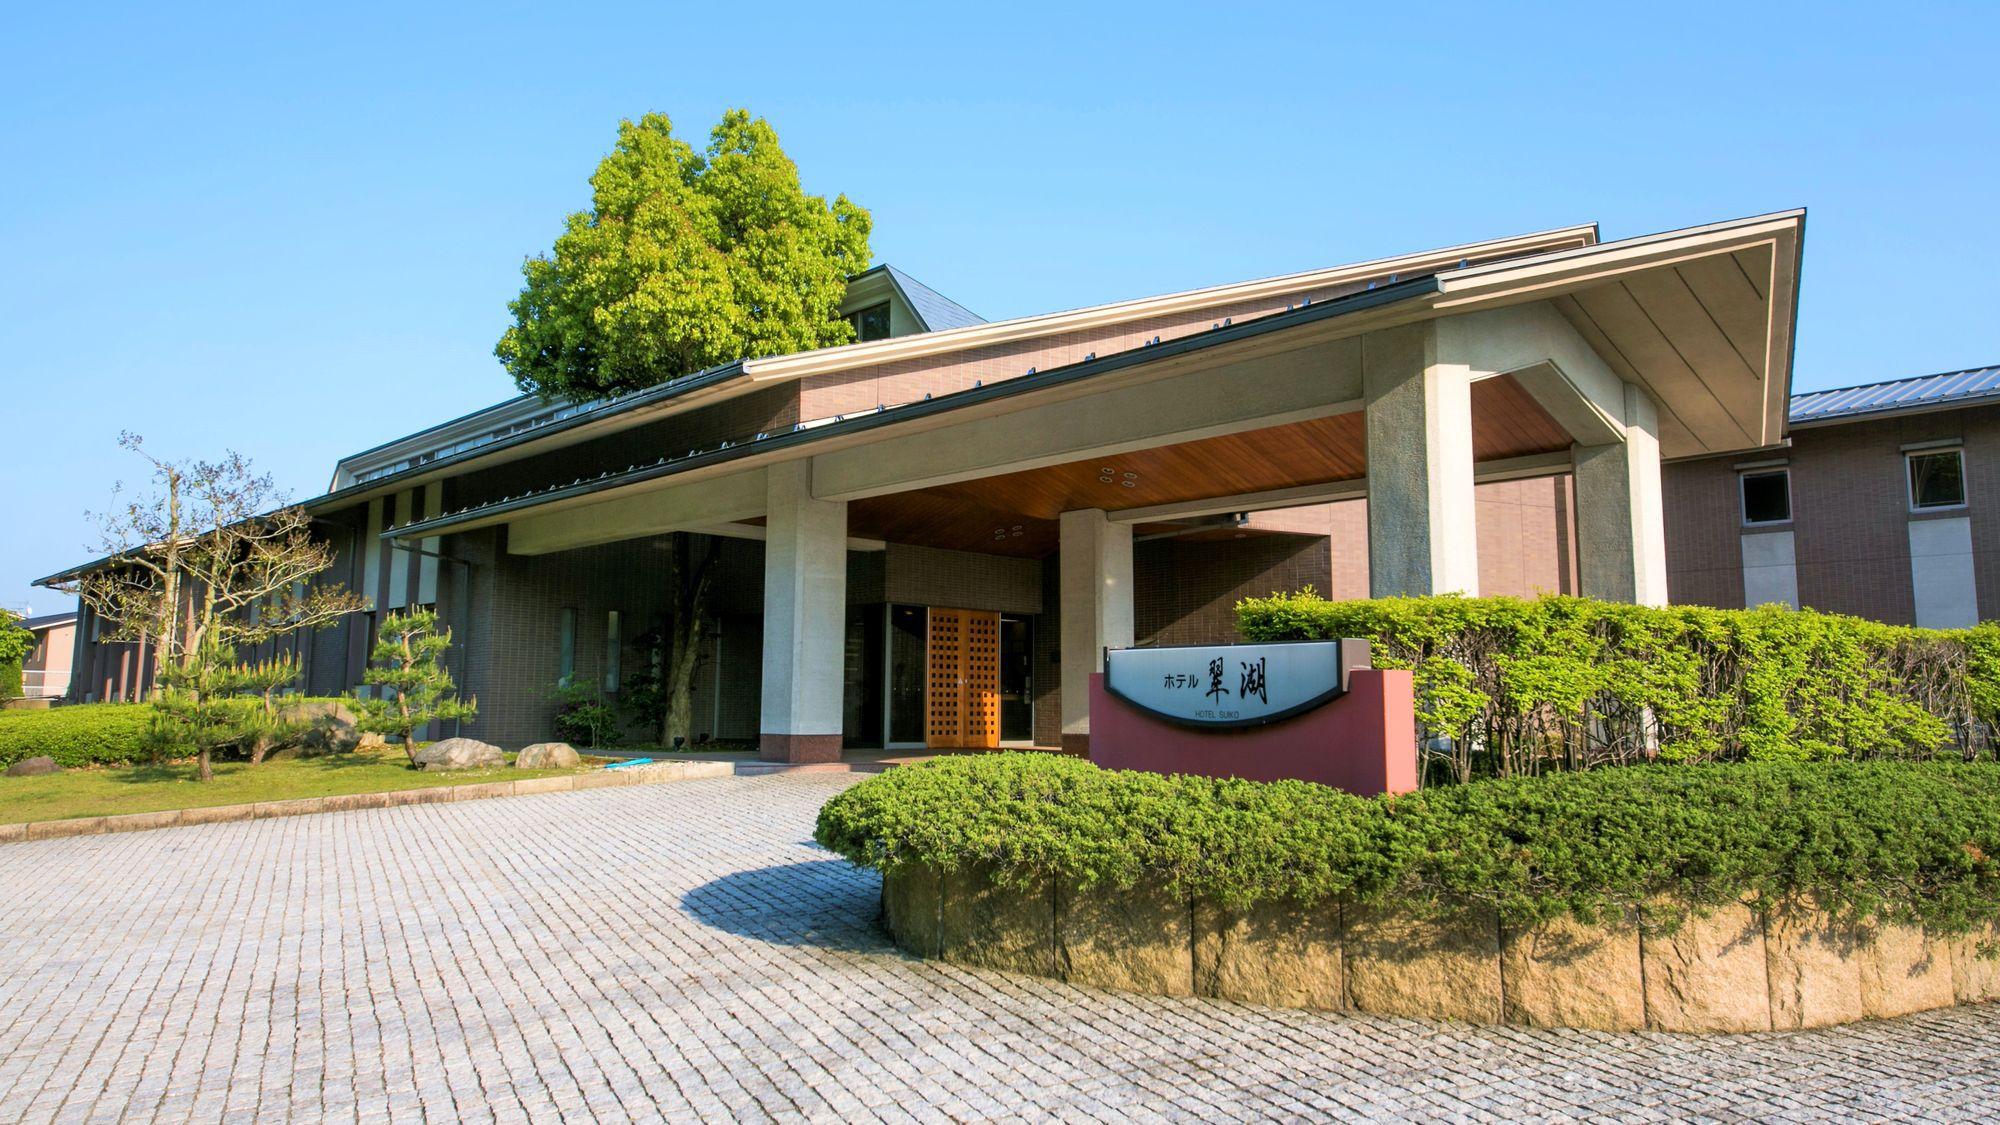 柴山温泉 ホテル翠湖 外観写真